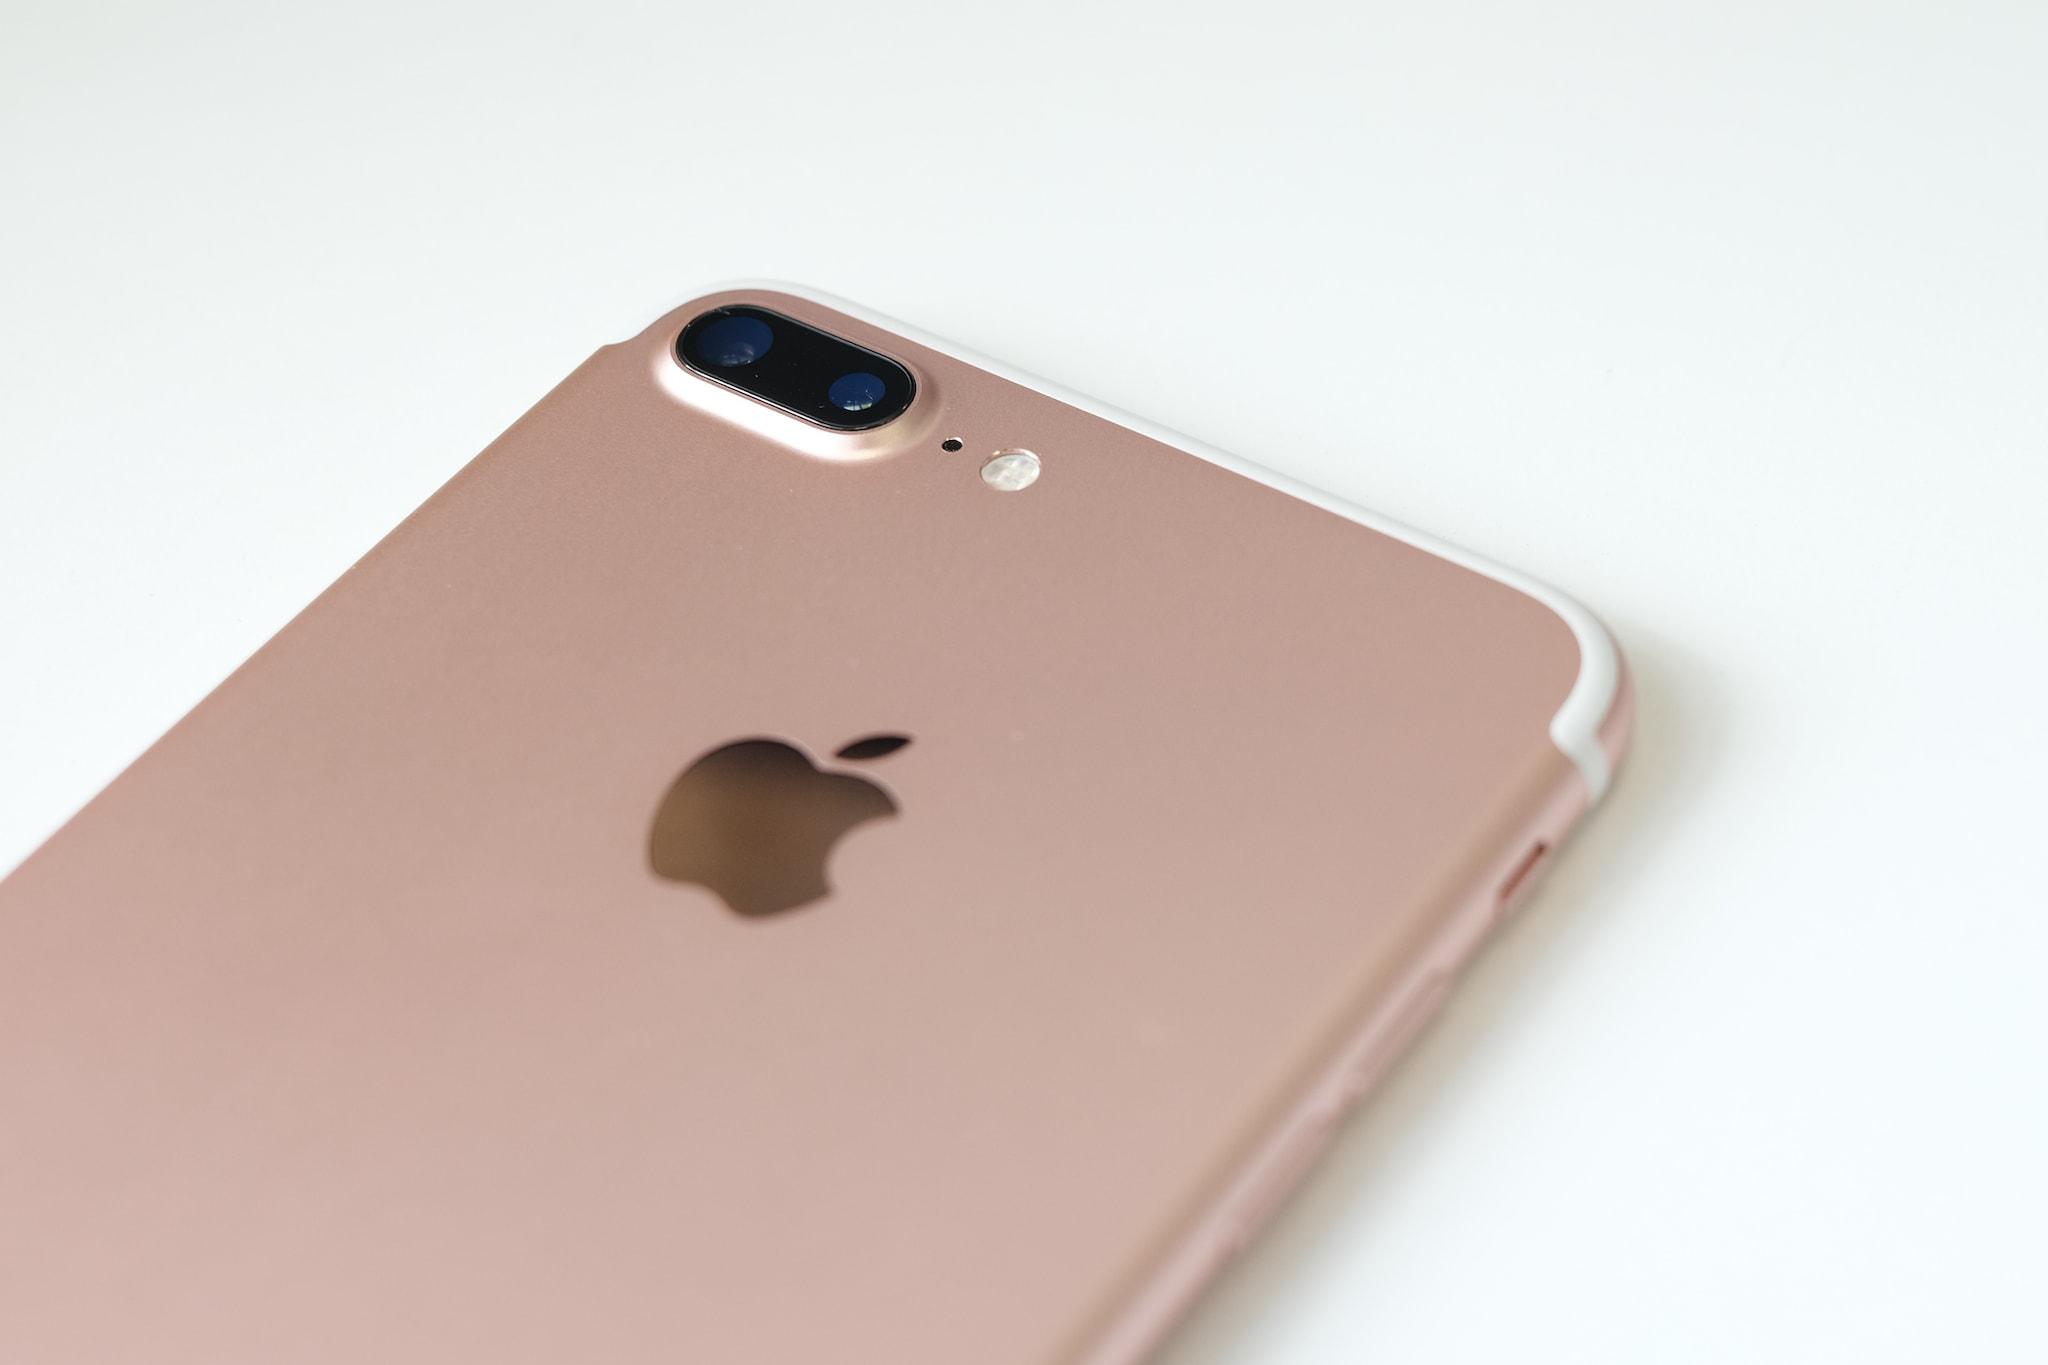 iPhone 7ના 32 જીબી રોઝ ગોલ્ડ વેરિએન્ટની ખરીદી પર 16% ડિસ્કાઉન્ટ આપવામાં આવી રહ્યું છે. આ ફોનની કિંમત 29,900 રૂપિયા છે, પરંતુ સેલમાં તે 24,999 રૂપિયામાં ઉપલબ્ધ છે. આ ઉપરાંત ફોનને ફક્ત 14,199 રૂપિયામાં ખરીદી શકાય છે. આ માટે તમને એક્સચેન્જ ઑફર આપવામાં આવી રહી છે.